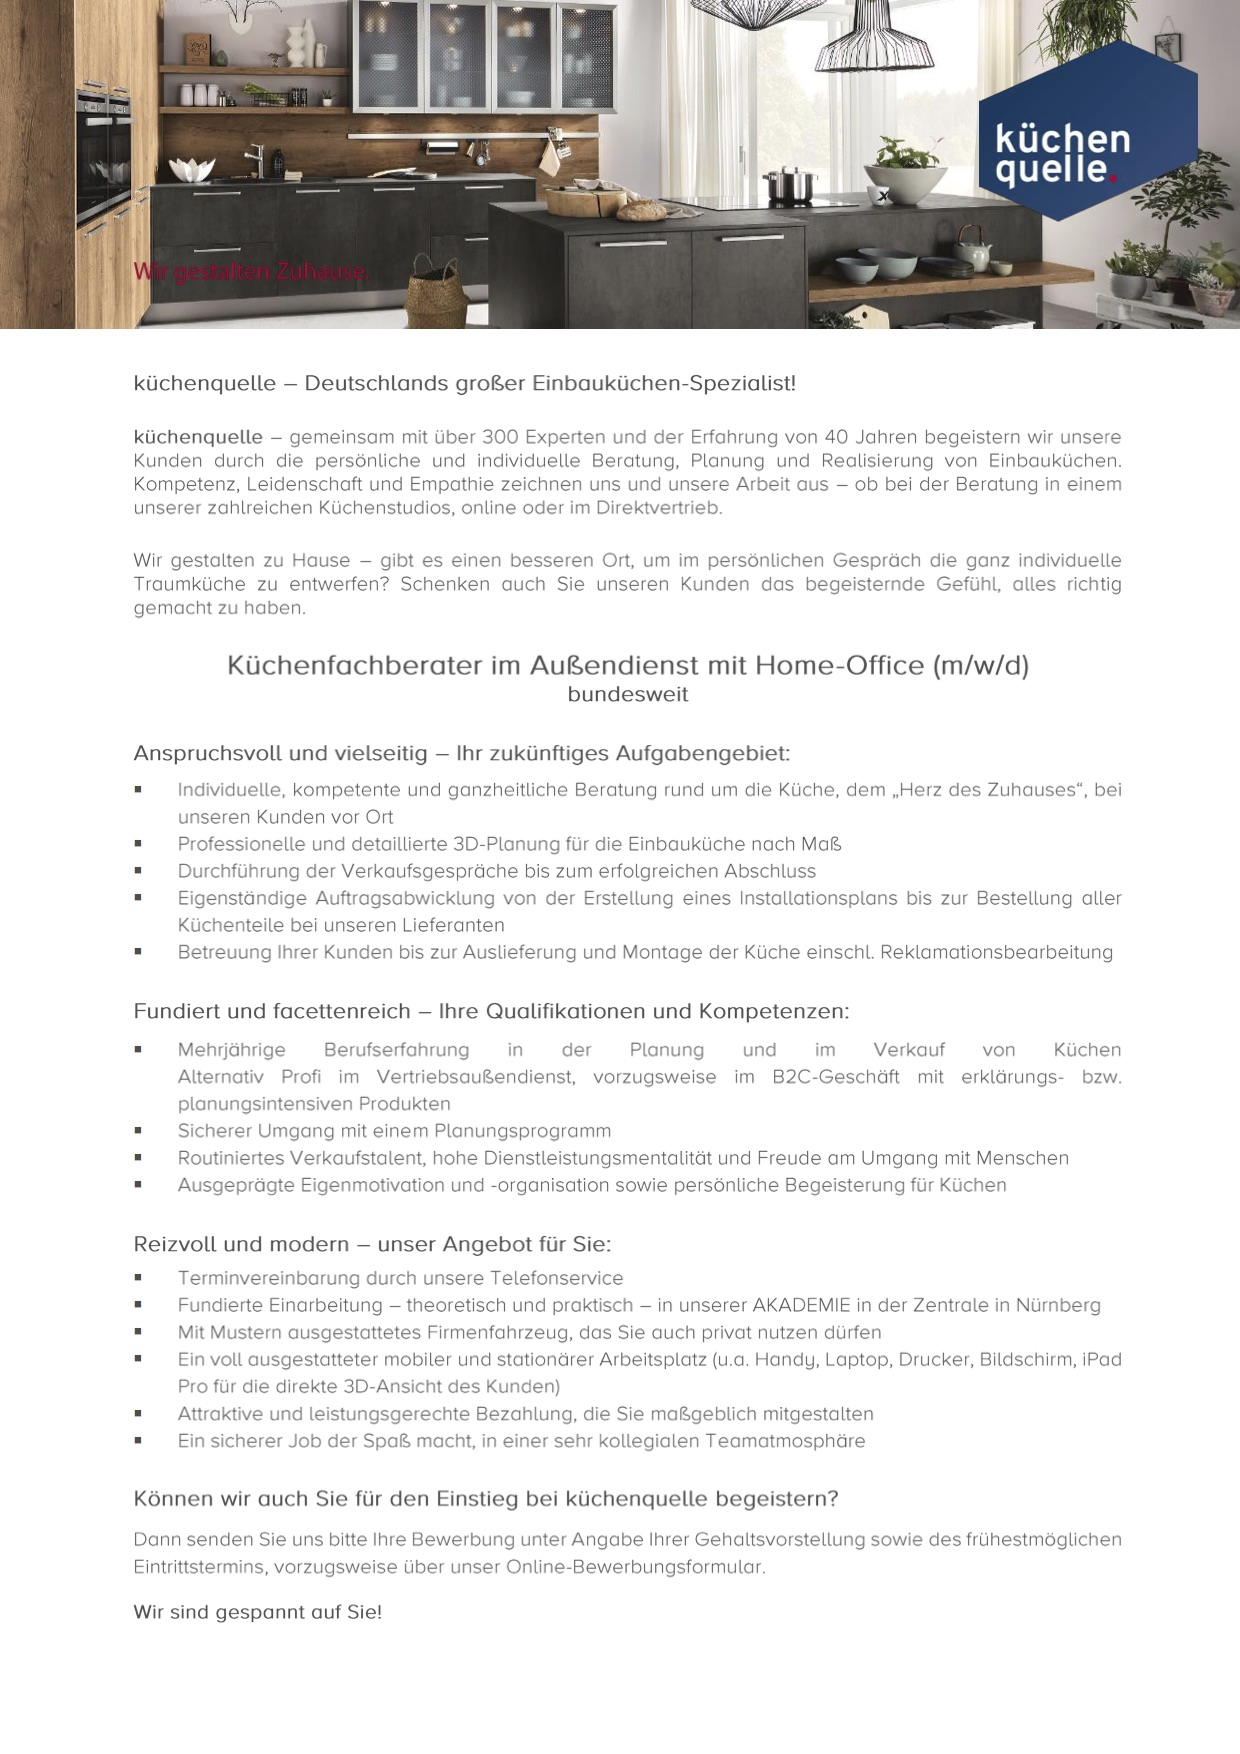 Kuchen Quelle Nurnberg Jobs – Caseconrad.com